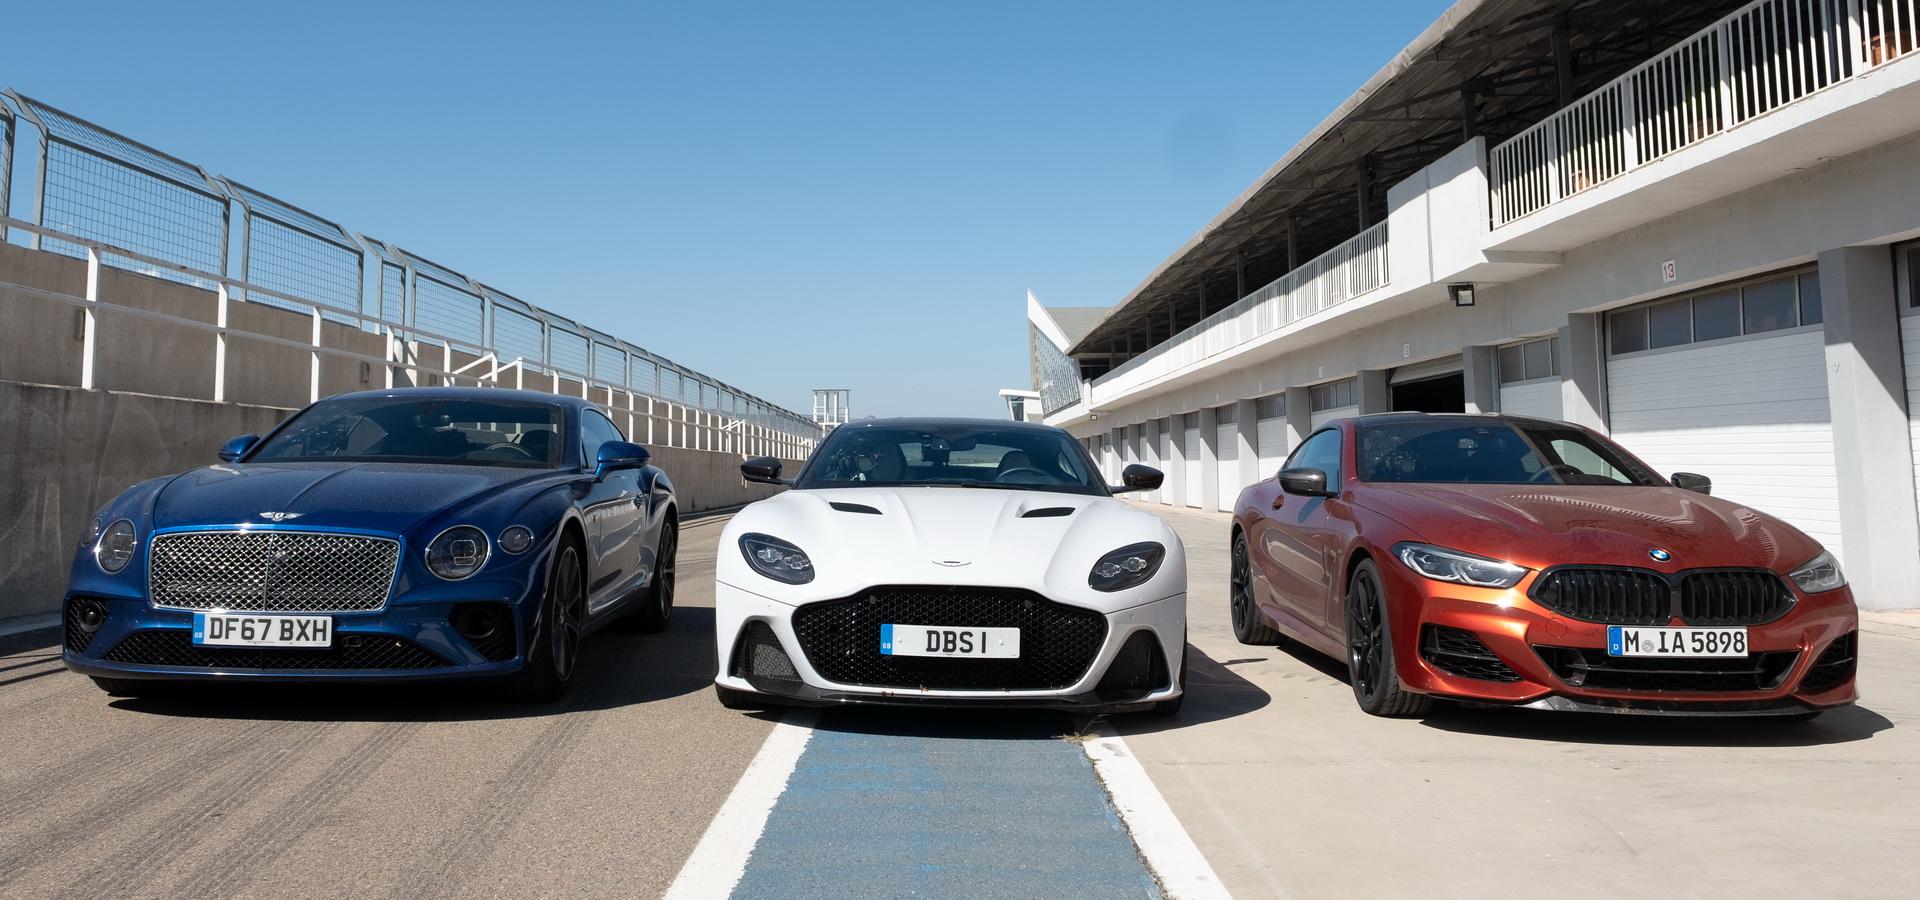 An Aston A Bentley And A Bmw Walk Into Azerbaijan With The Grand Tour Carscoops